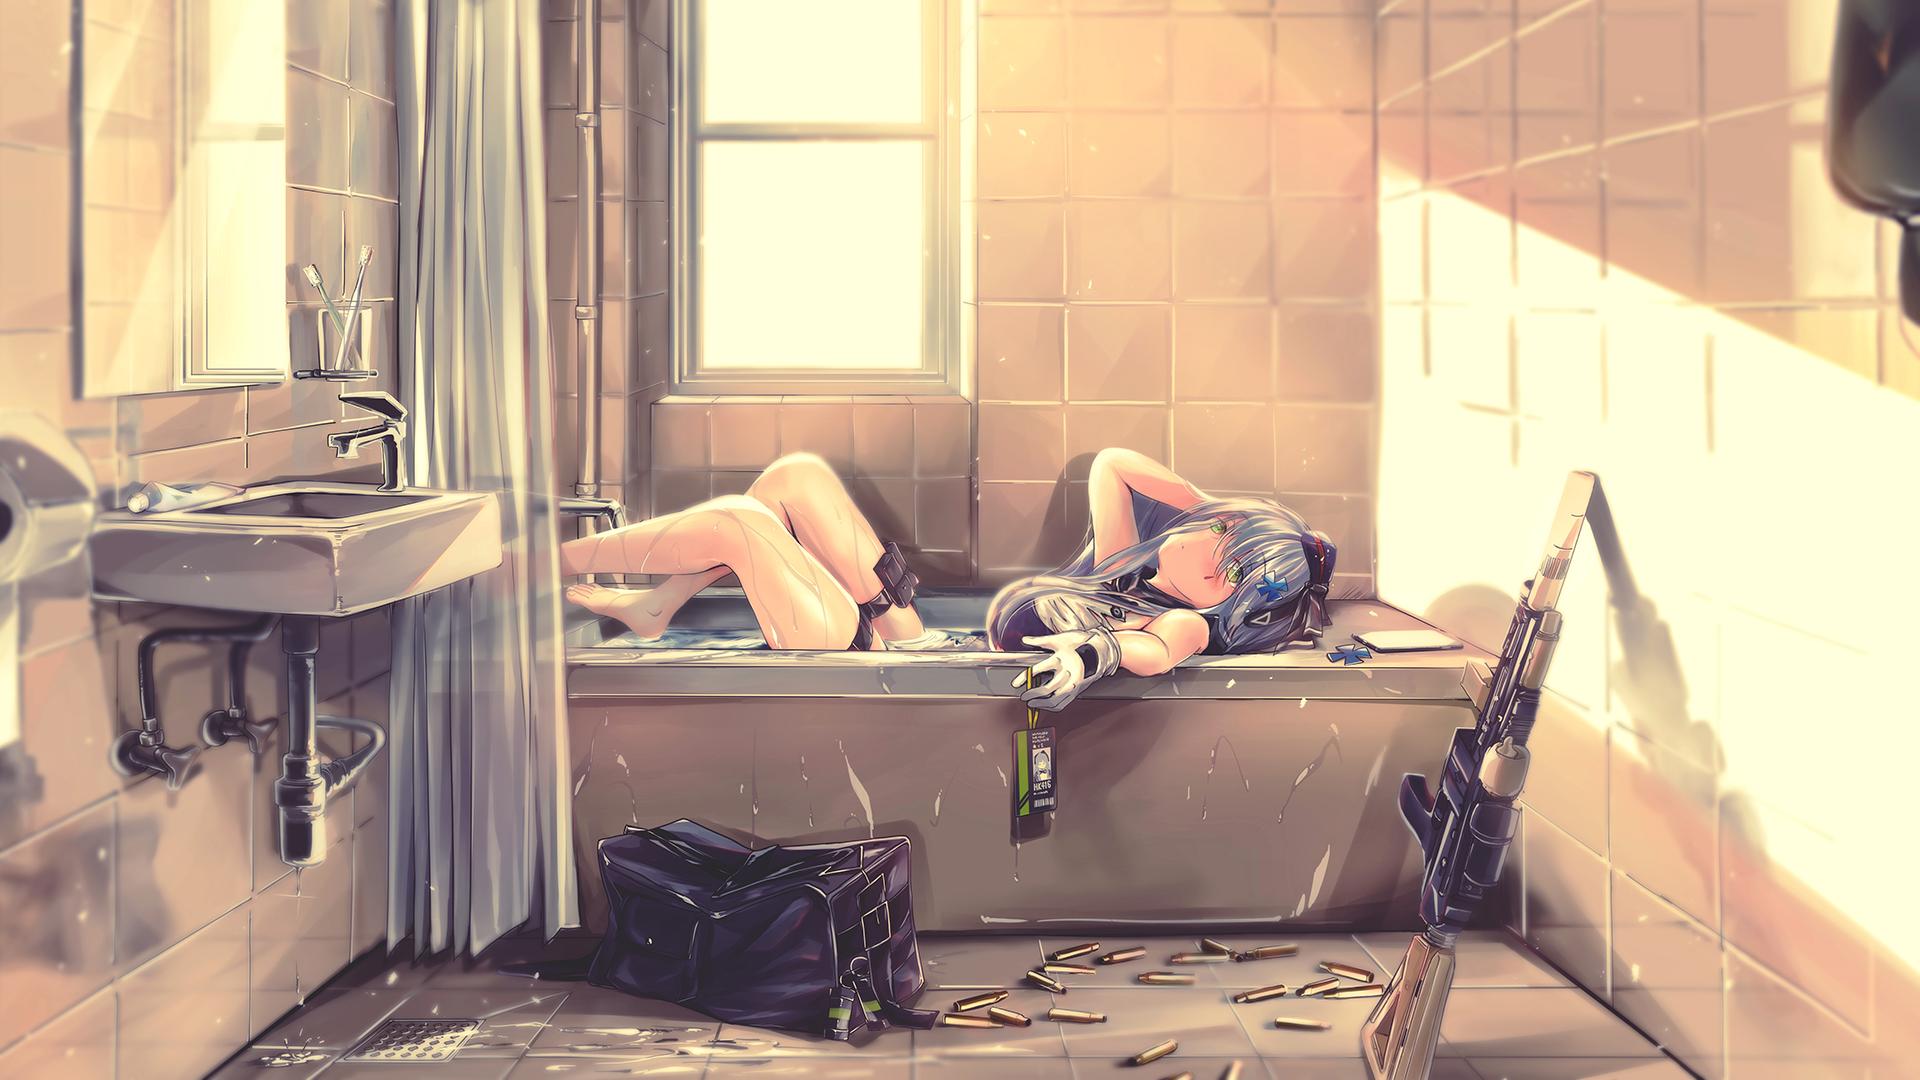 Anime 1920x1080 gun water ammunition weapon Girls Frontline HK416 (Girls Frontline) in bathtub bathtub anime girls anime indoors